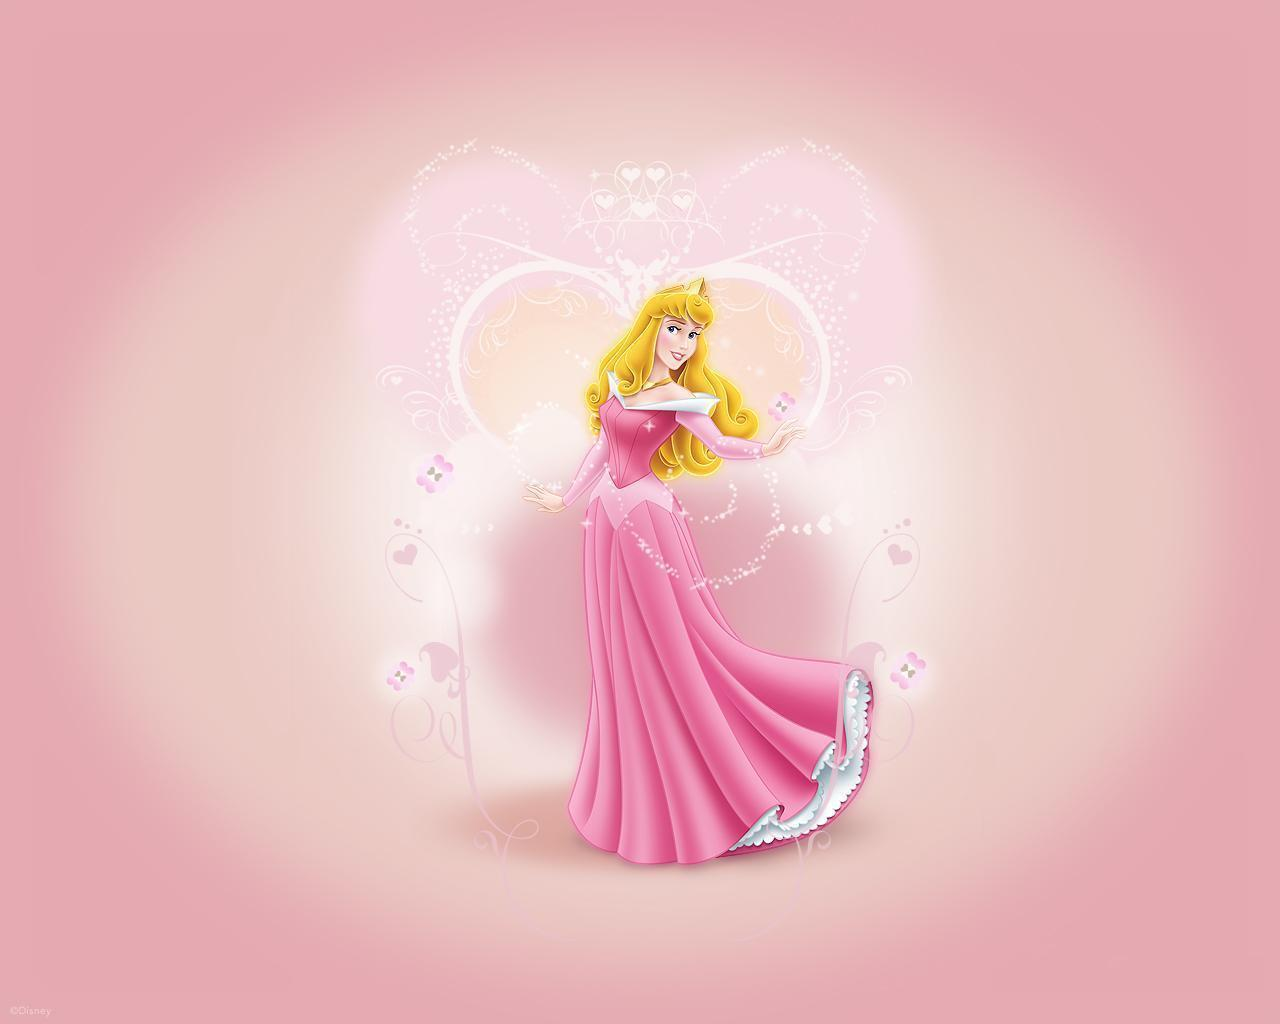 Sleeping Beauty   Sleeping Beauty Wallpaper 13785820 1280x1024